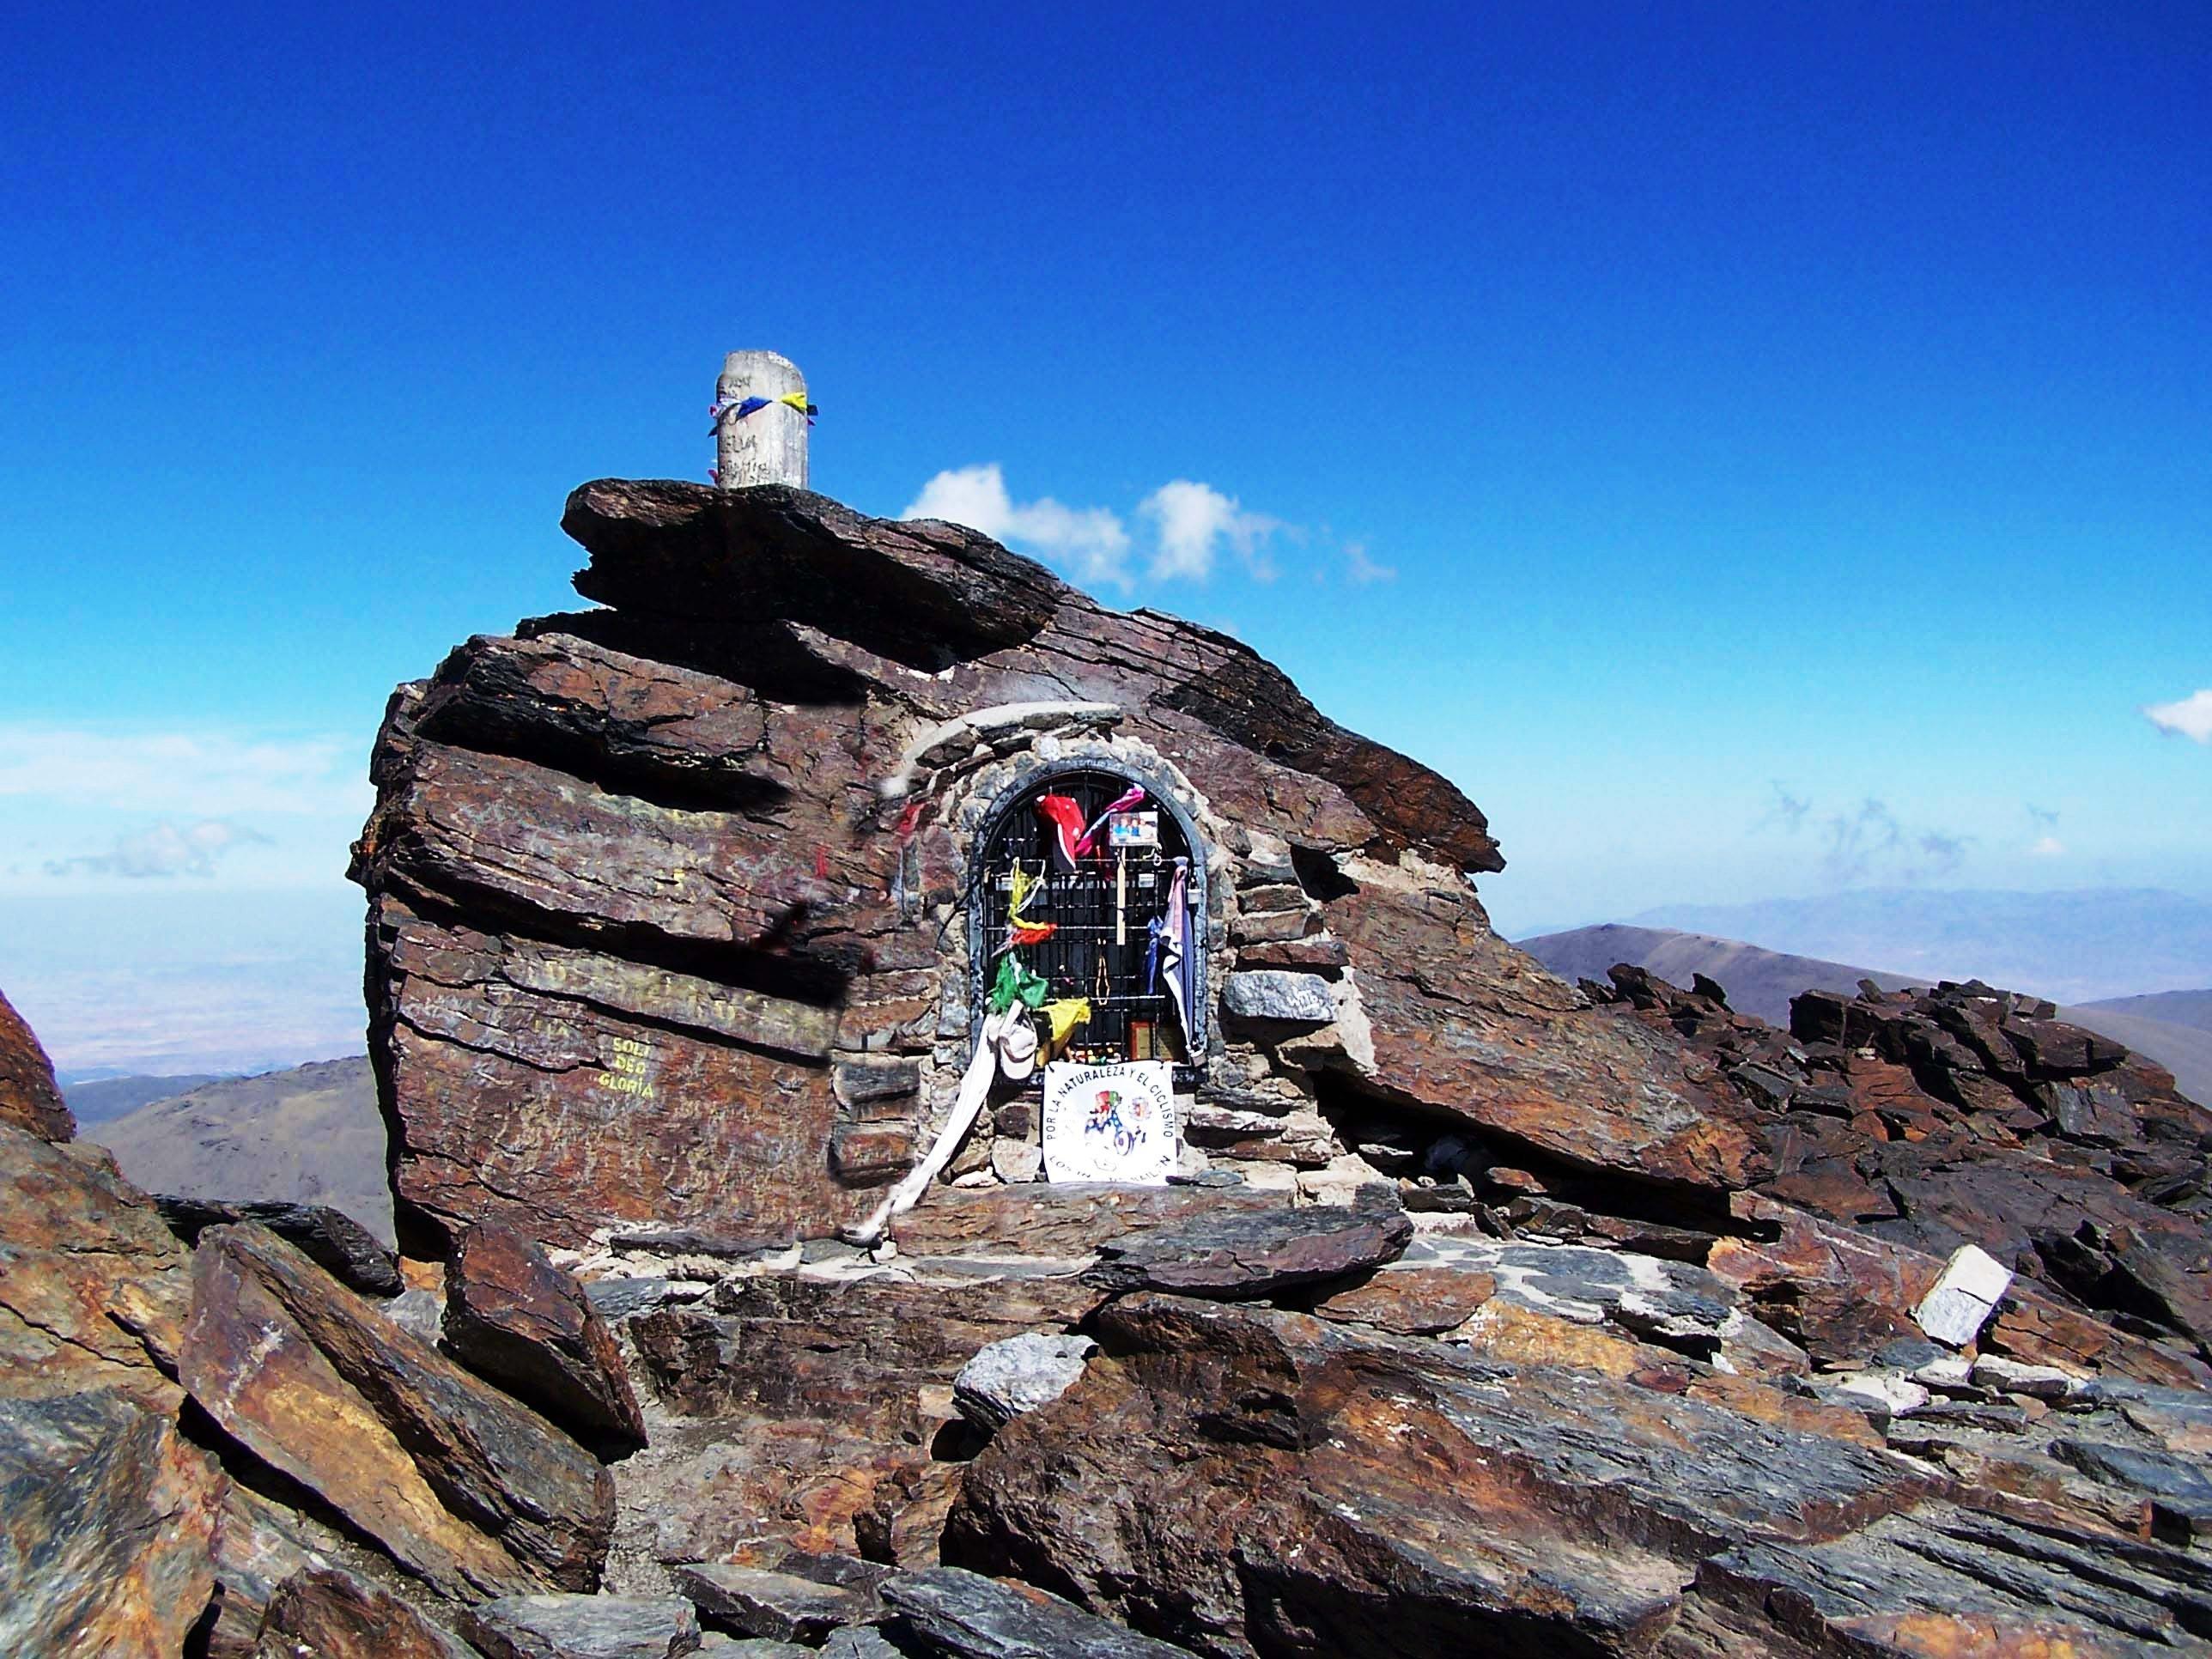 Mainland Spain's highest peak isn't that tough in Summer...